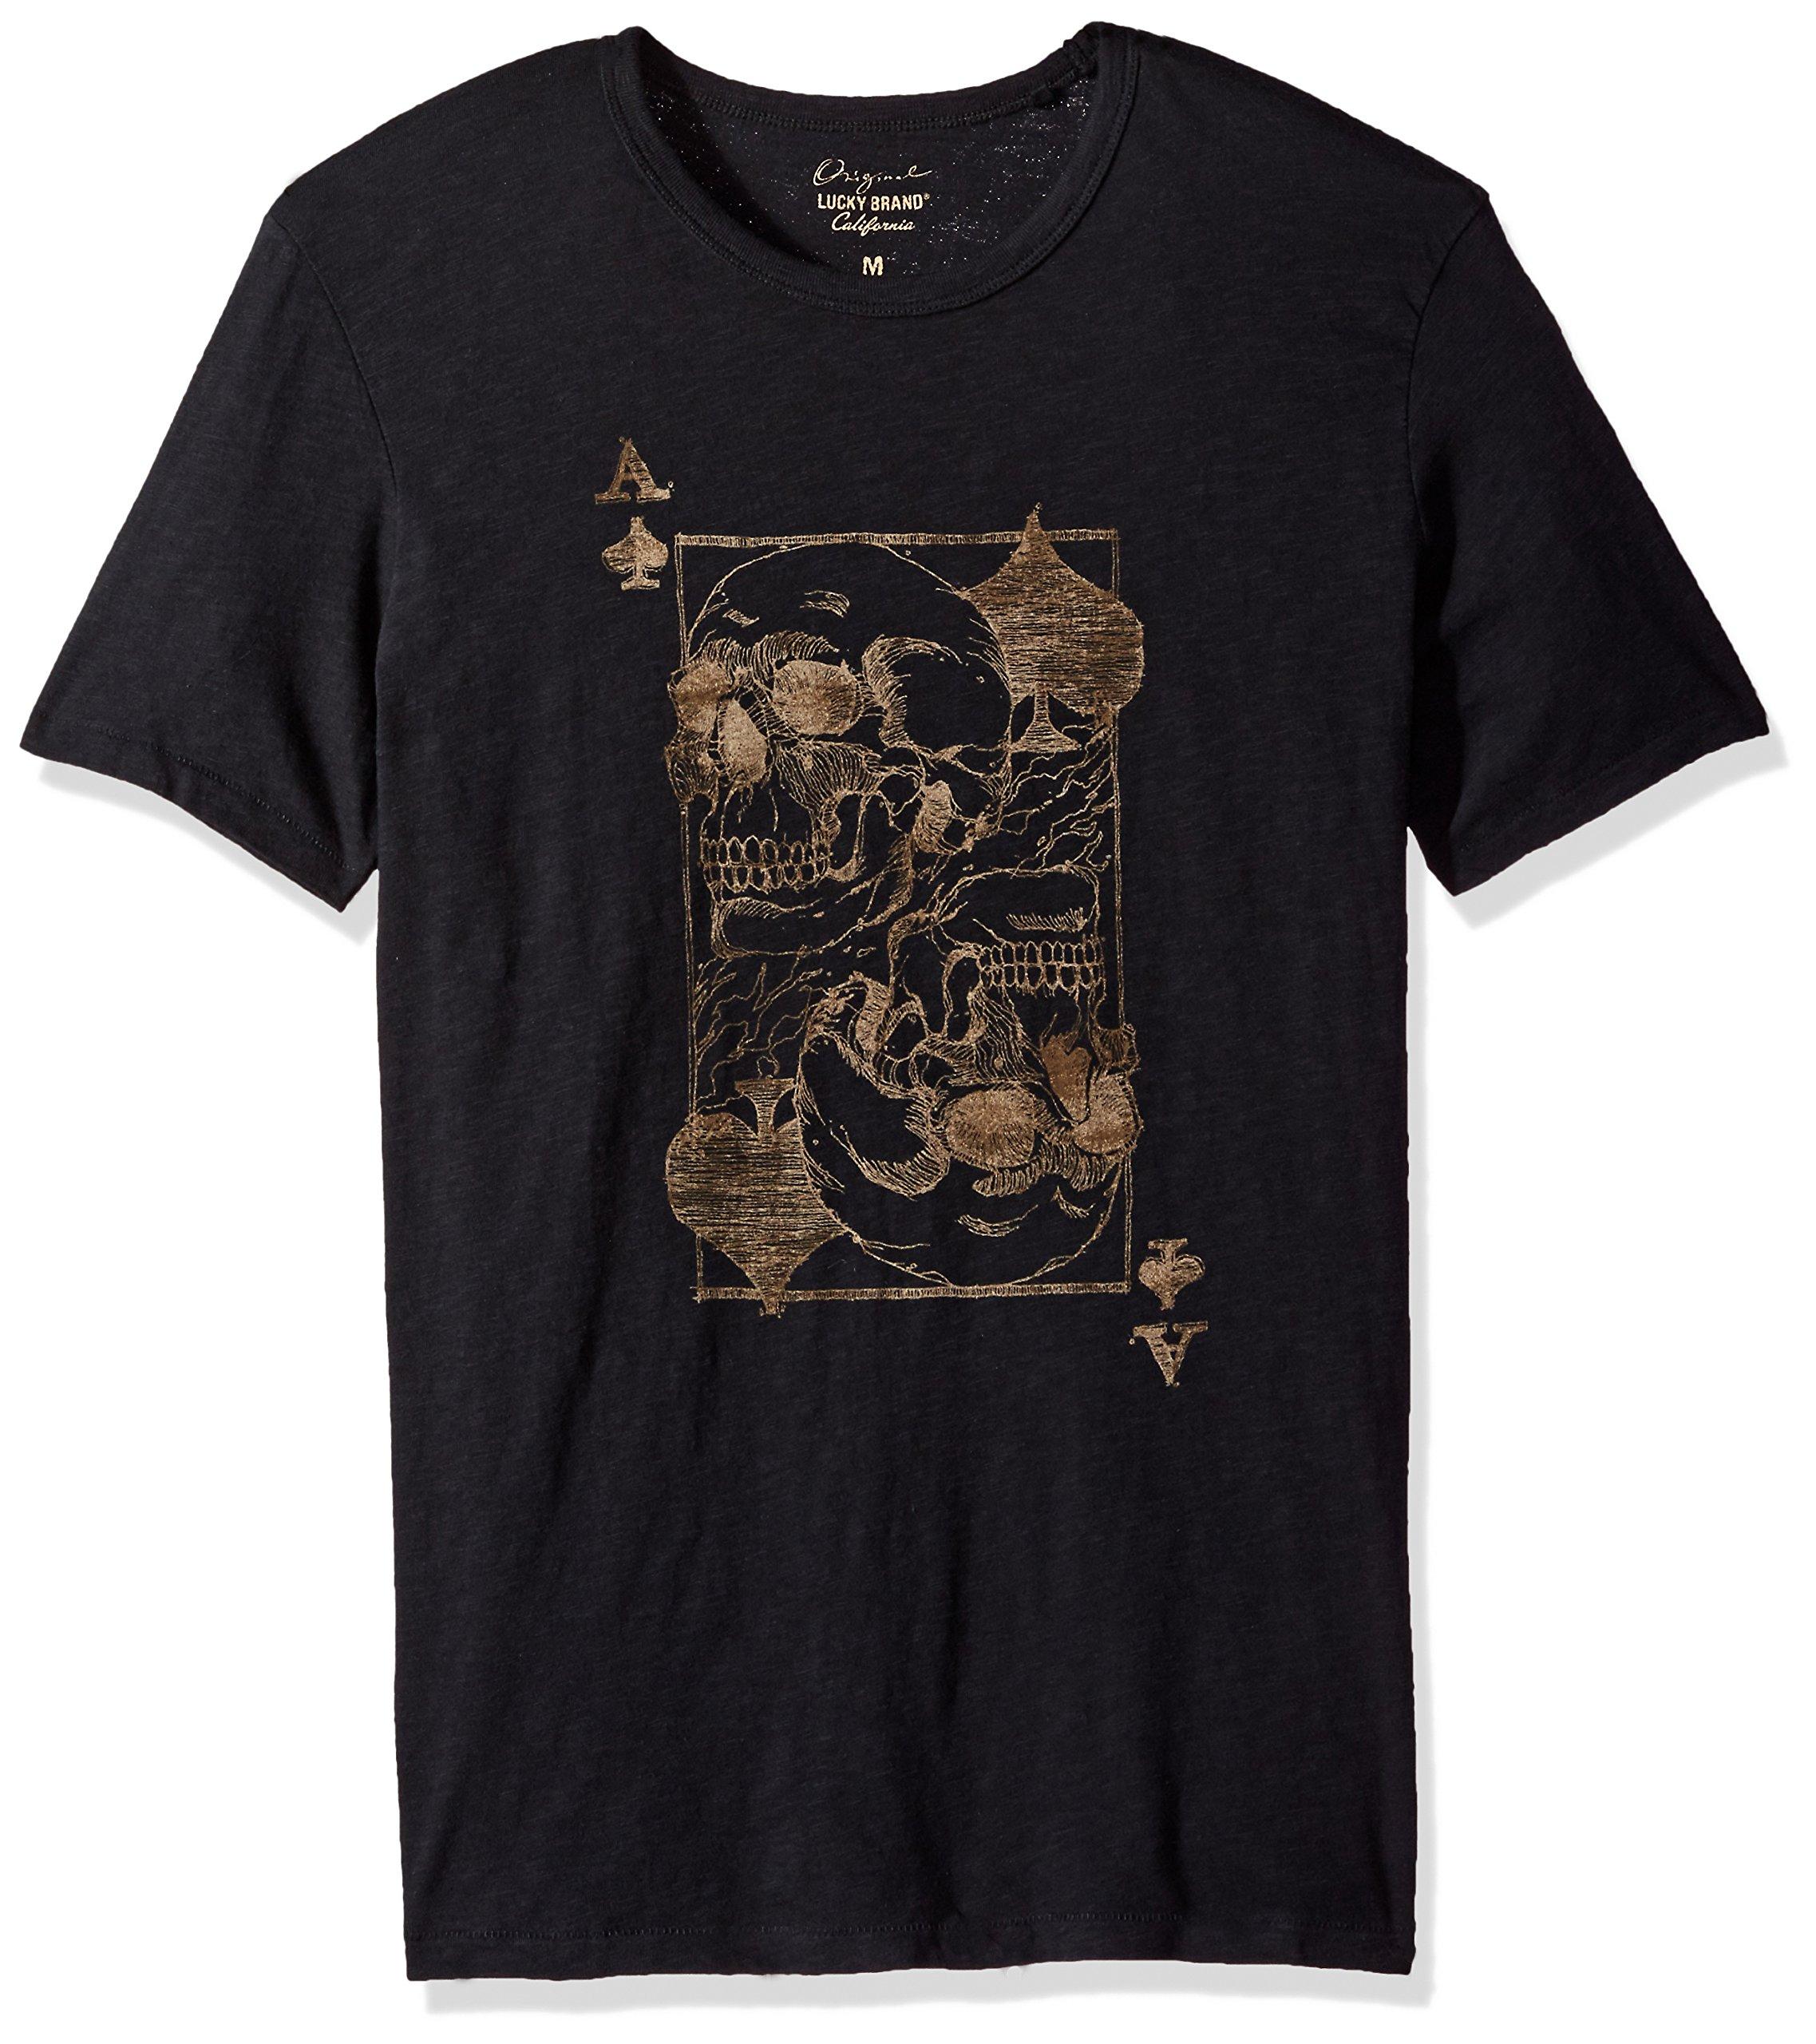 Lucky Brand Men's Ace Skulls Graphic Tee, Jet Black, X-Large